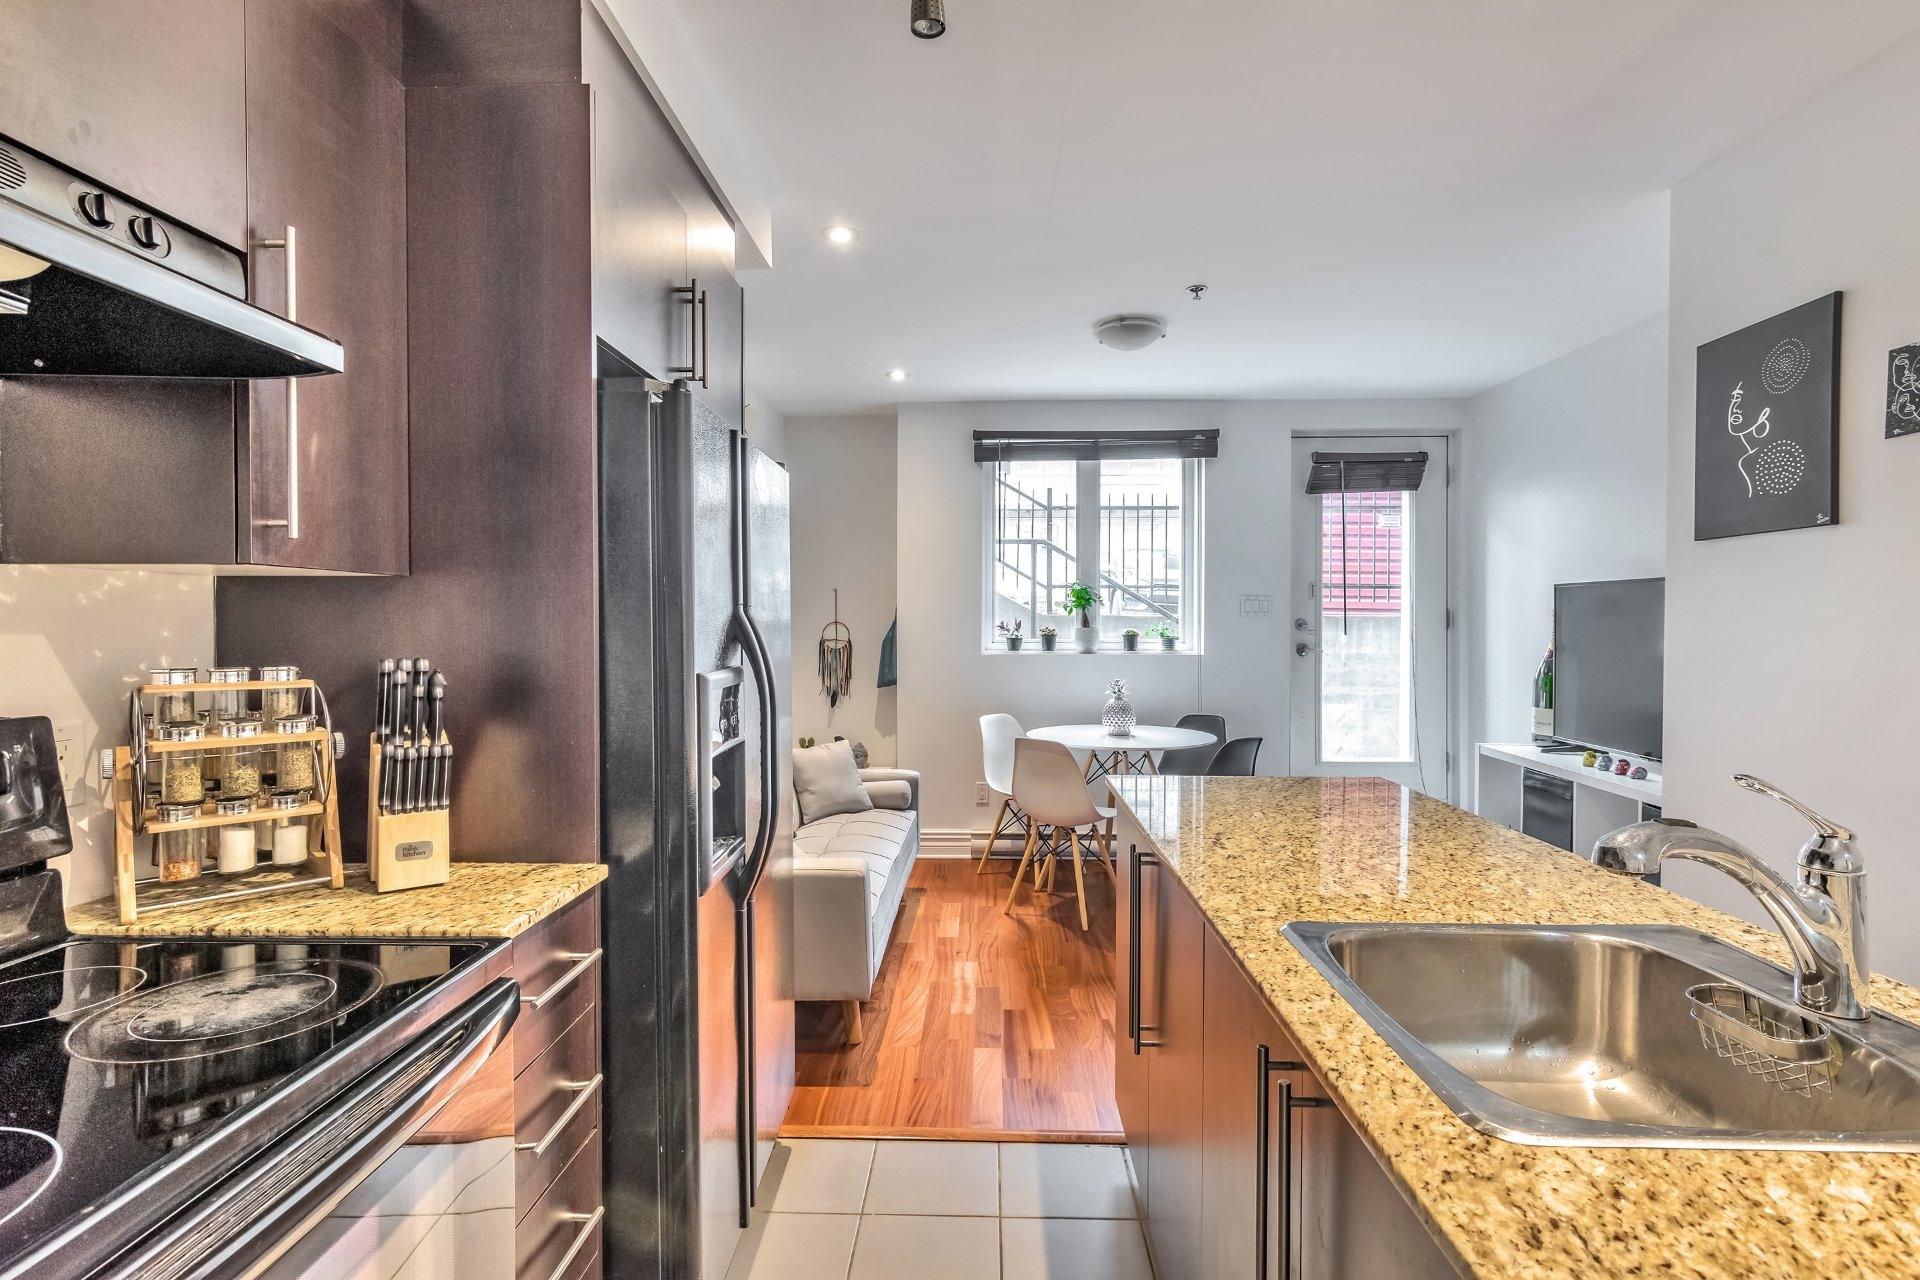 image 10 - Departamento En venta Le Plateau-Mont-Royal Montréal  - 3 habitaciones